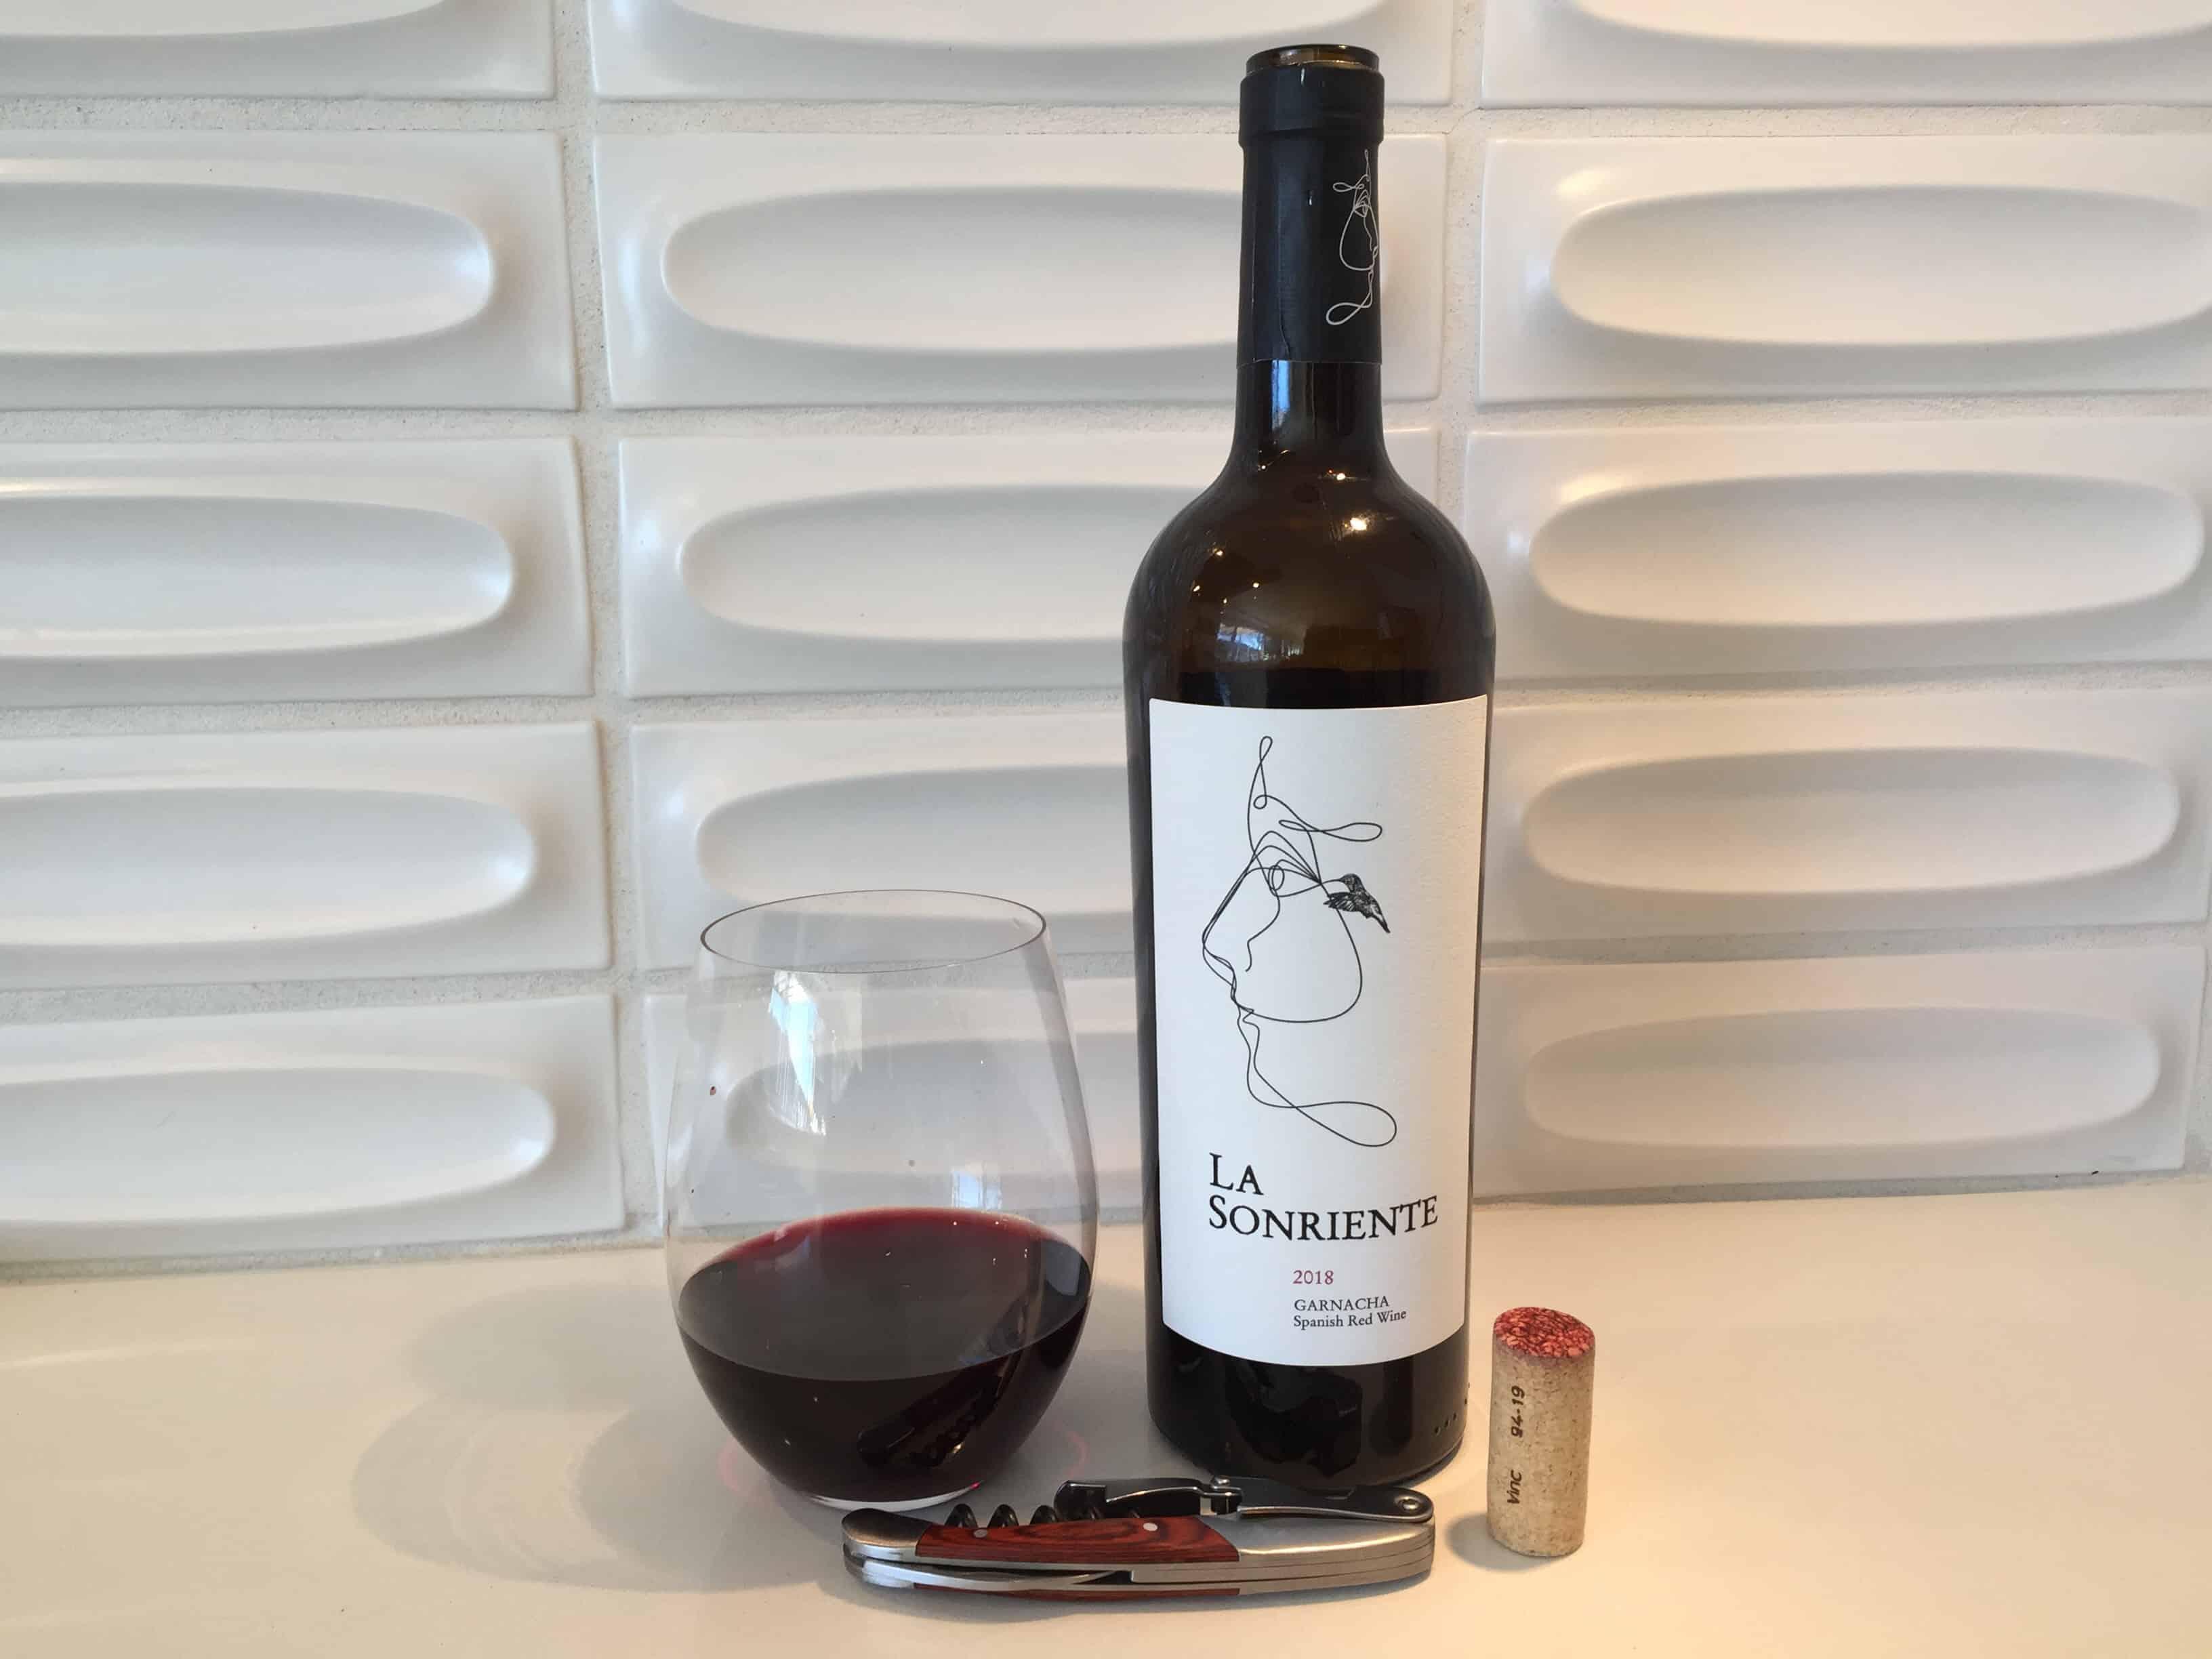 Glass and bottle of La Sonriente Garnacha Spanish red wine